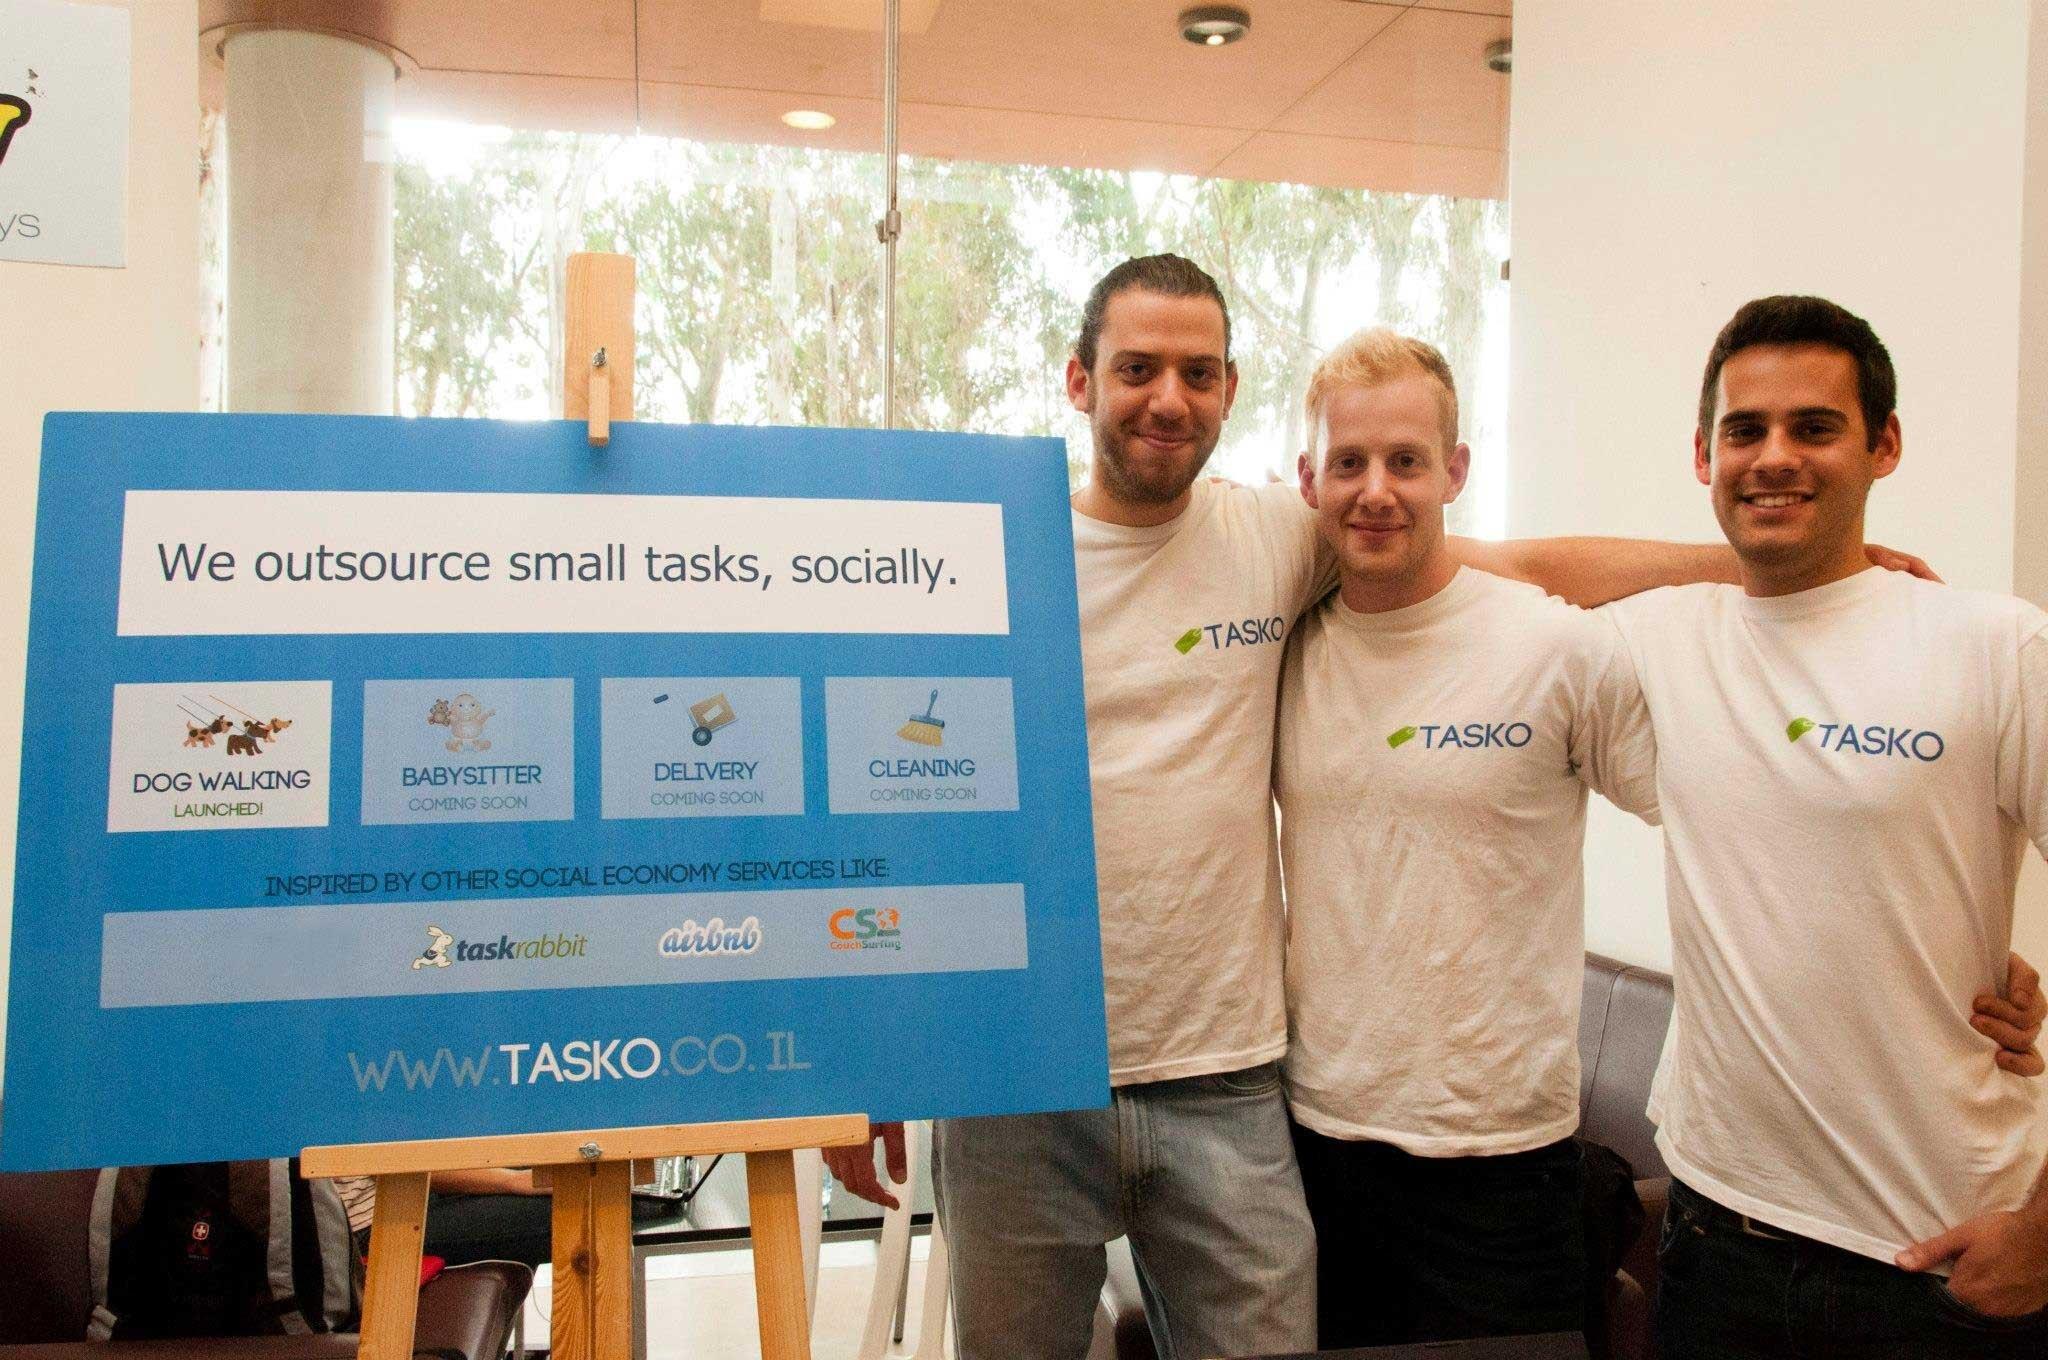 The Tasko team